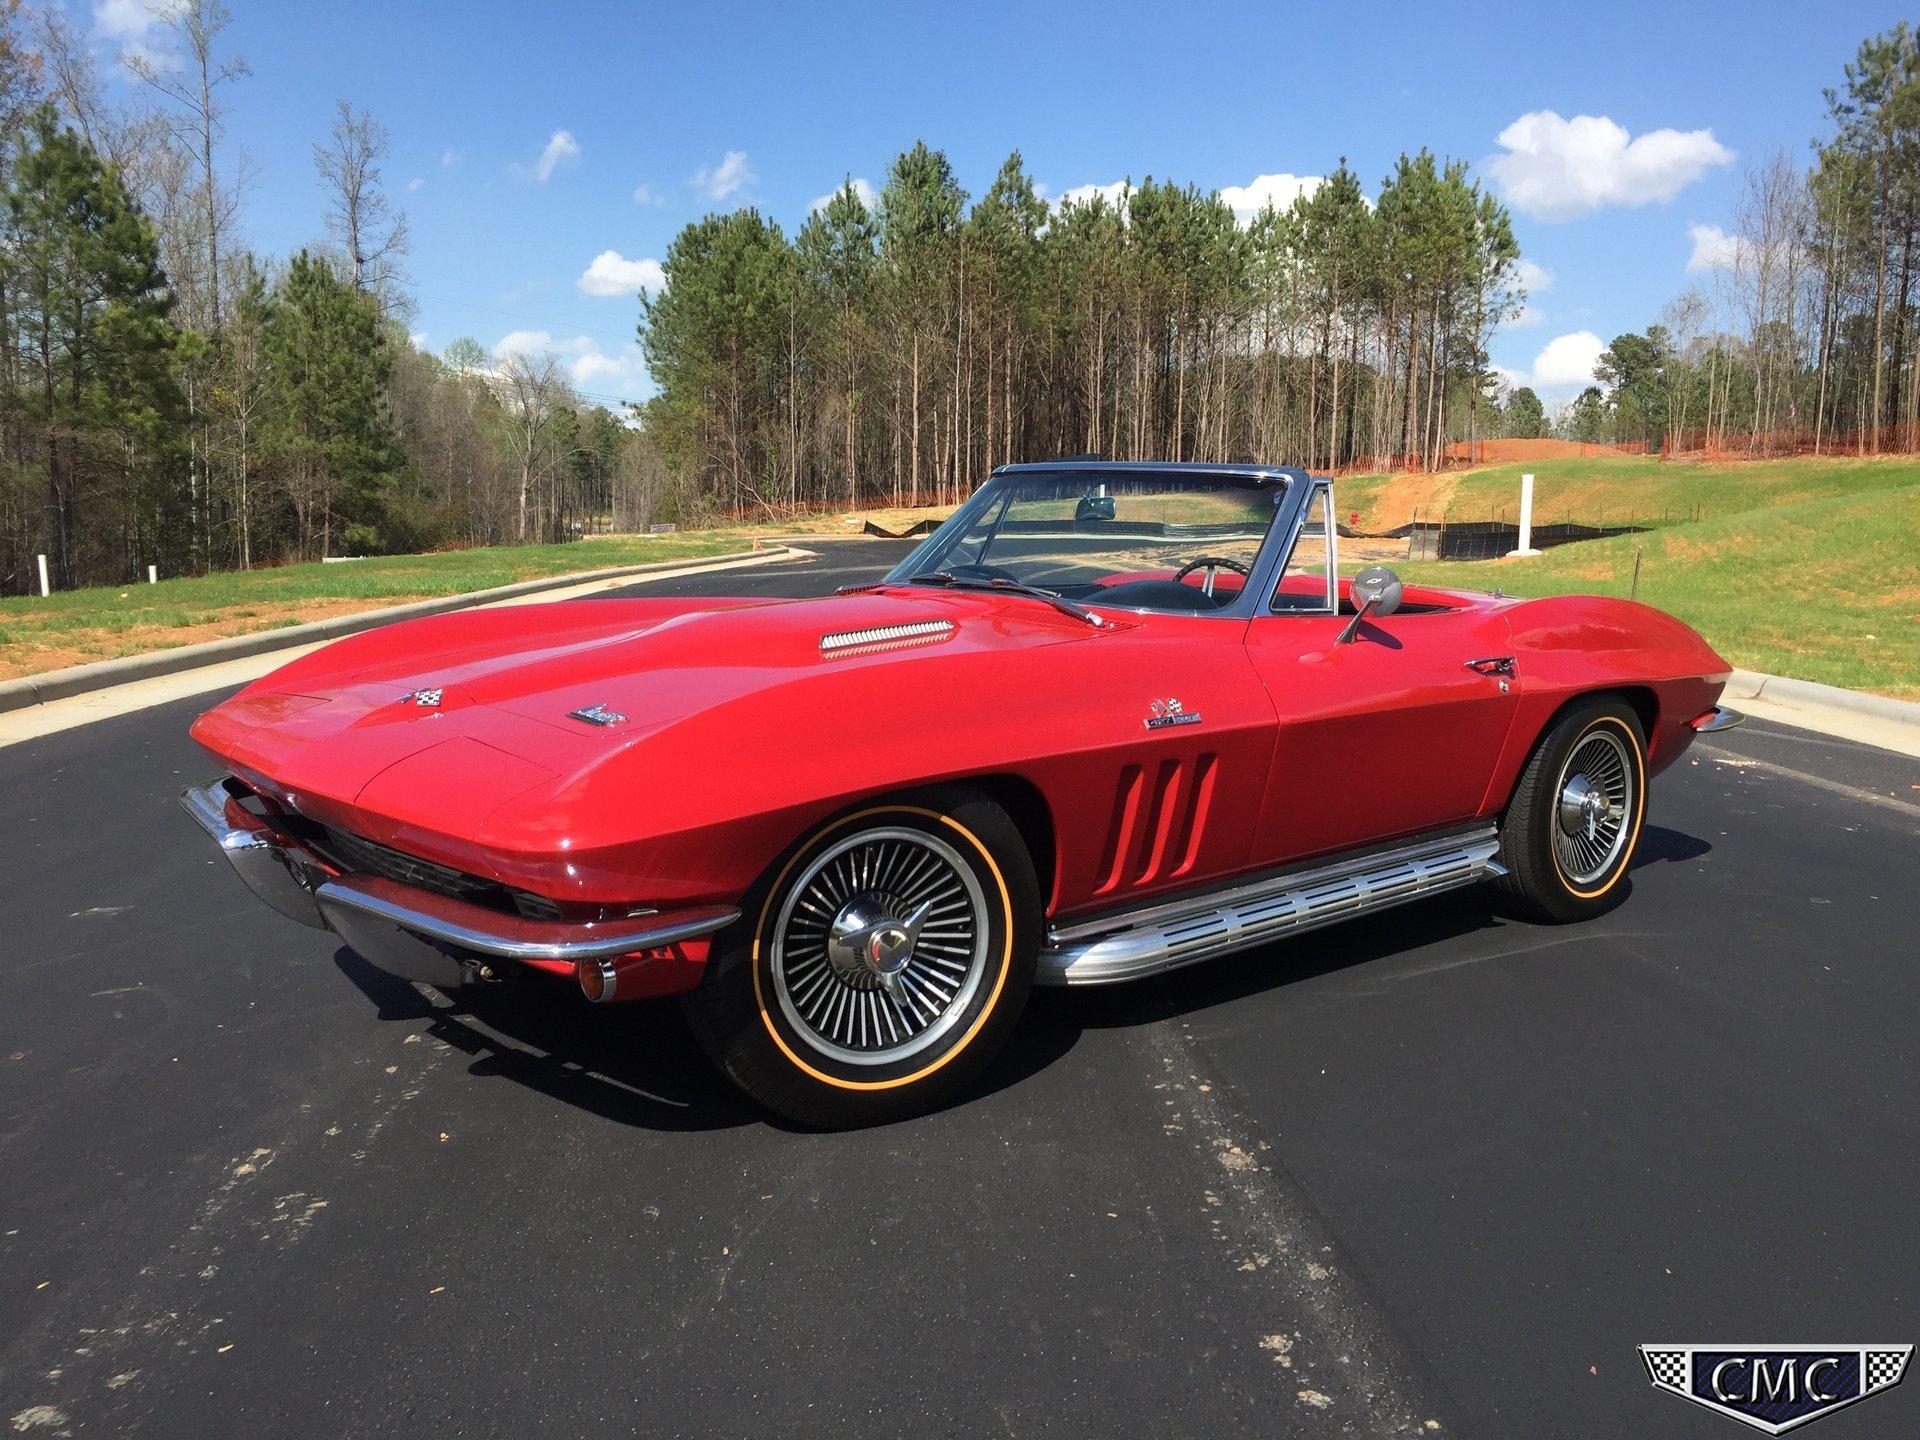 1966 Chevrolet Corvette Stingray Carolina Muscle Cars Inc Chevy